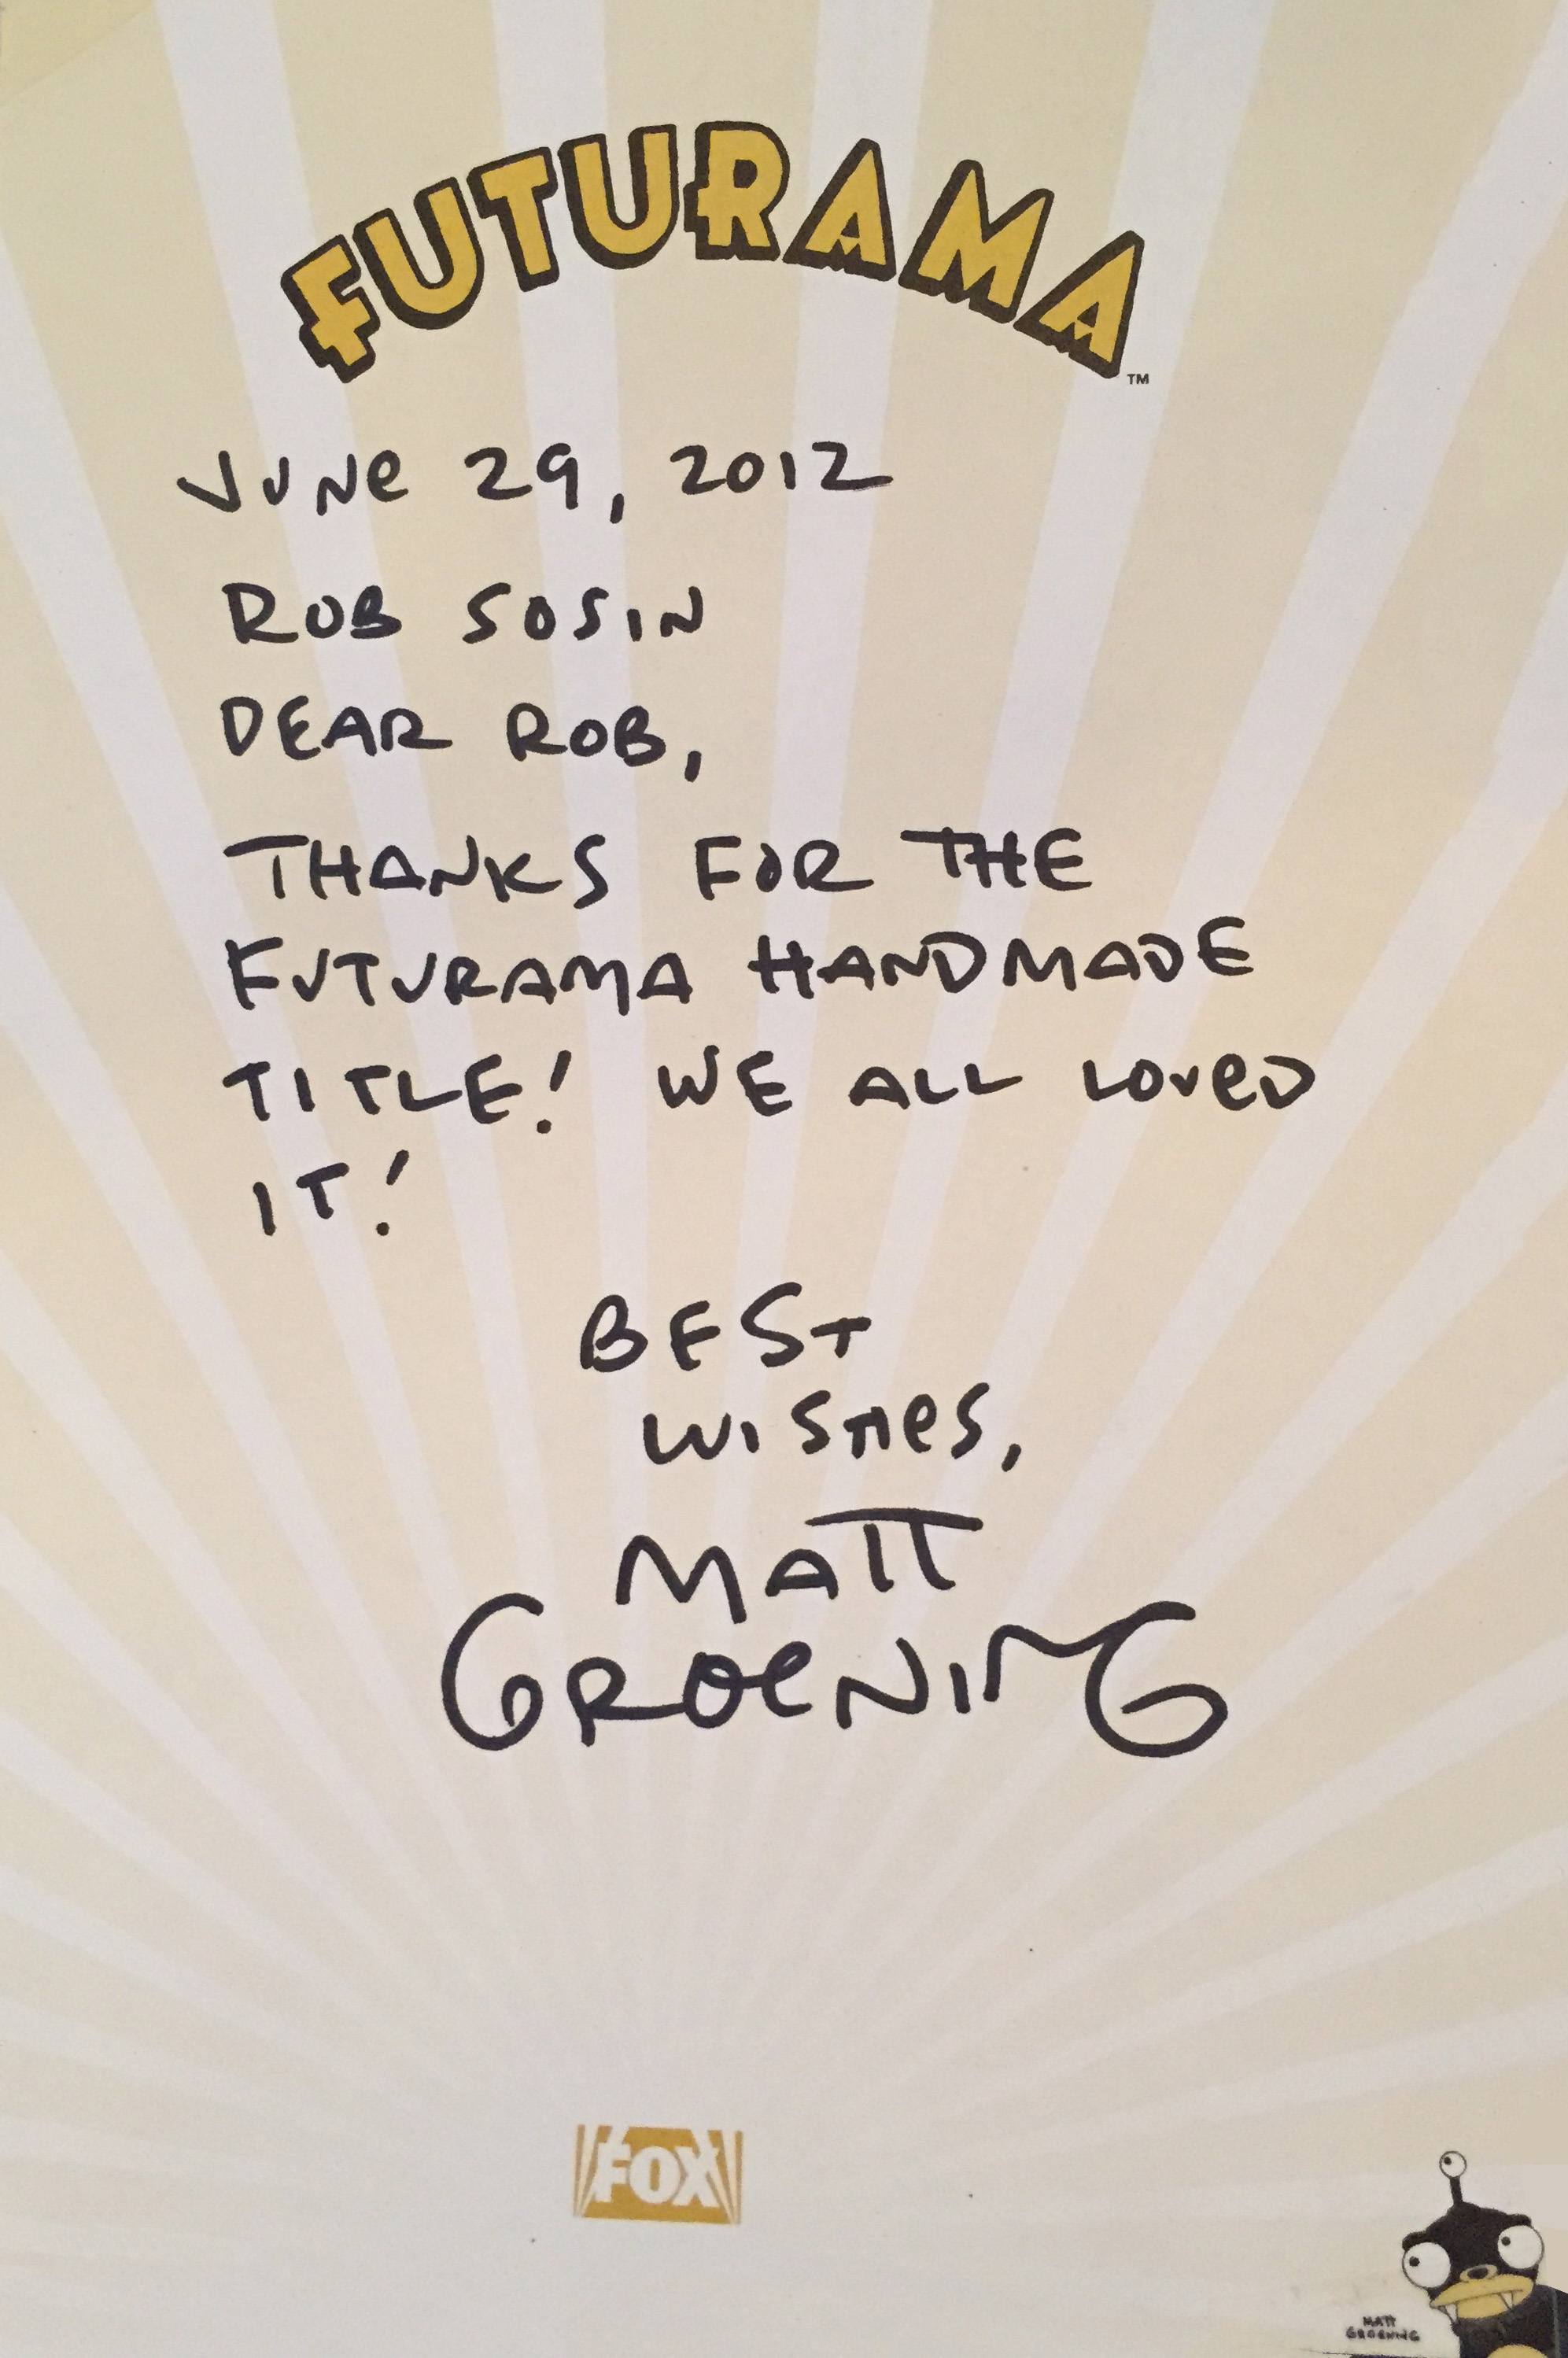 GroeningFuturamaLetter.jpg